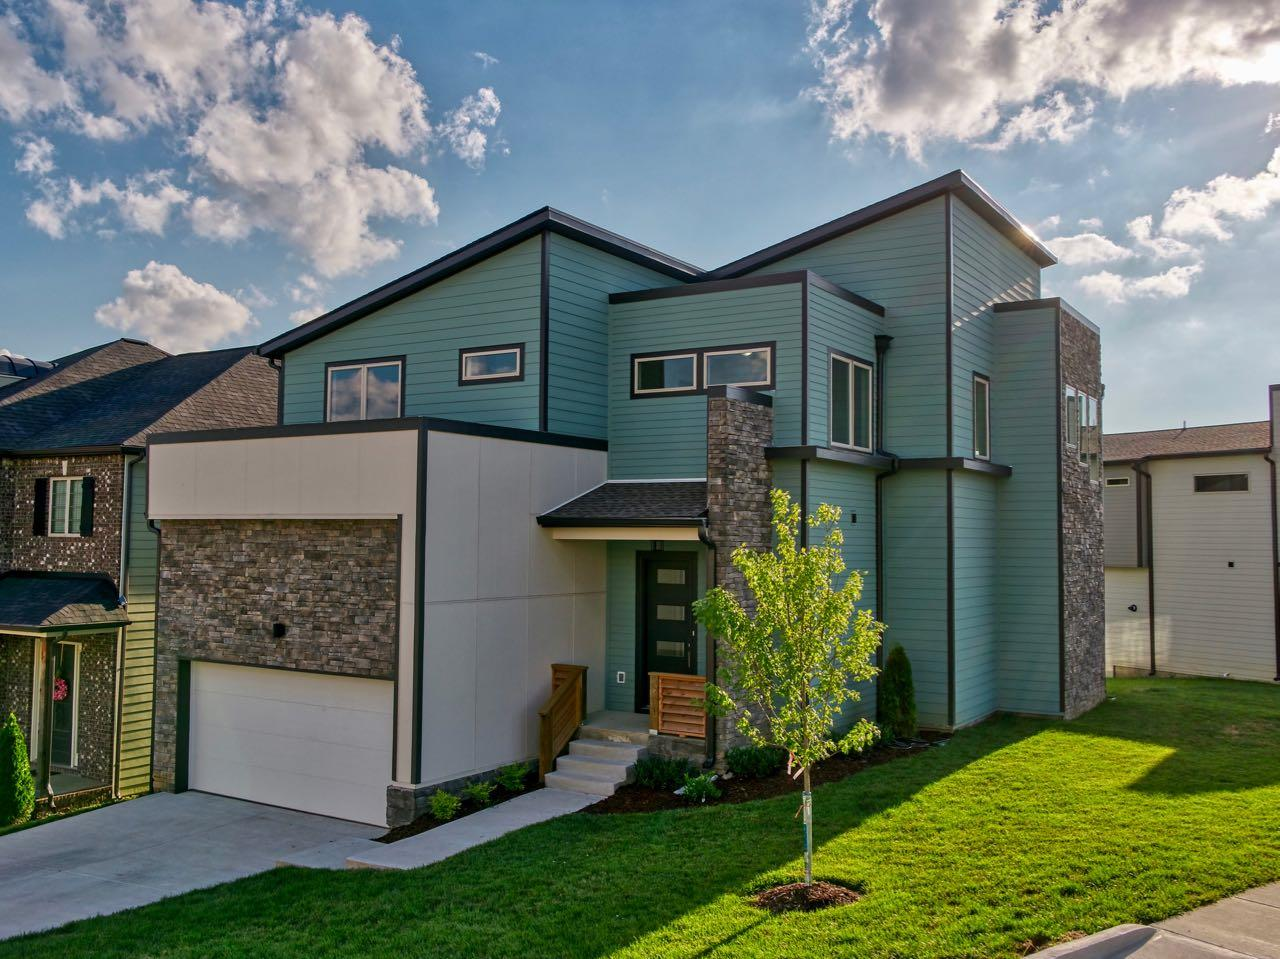 1721 Boxwood DR LOT 106, Nashville, TN 37211 - Nashville, TN real estate listing